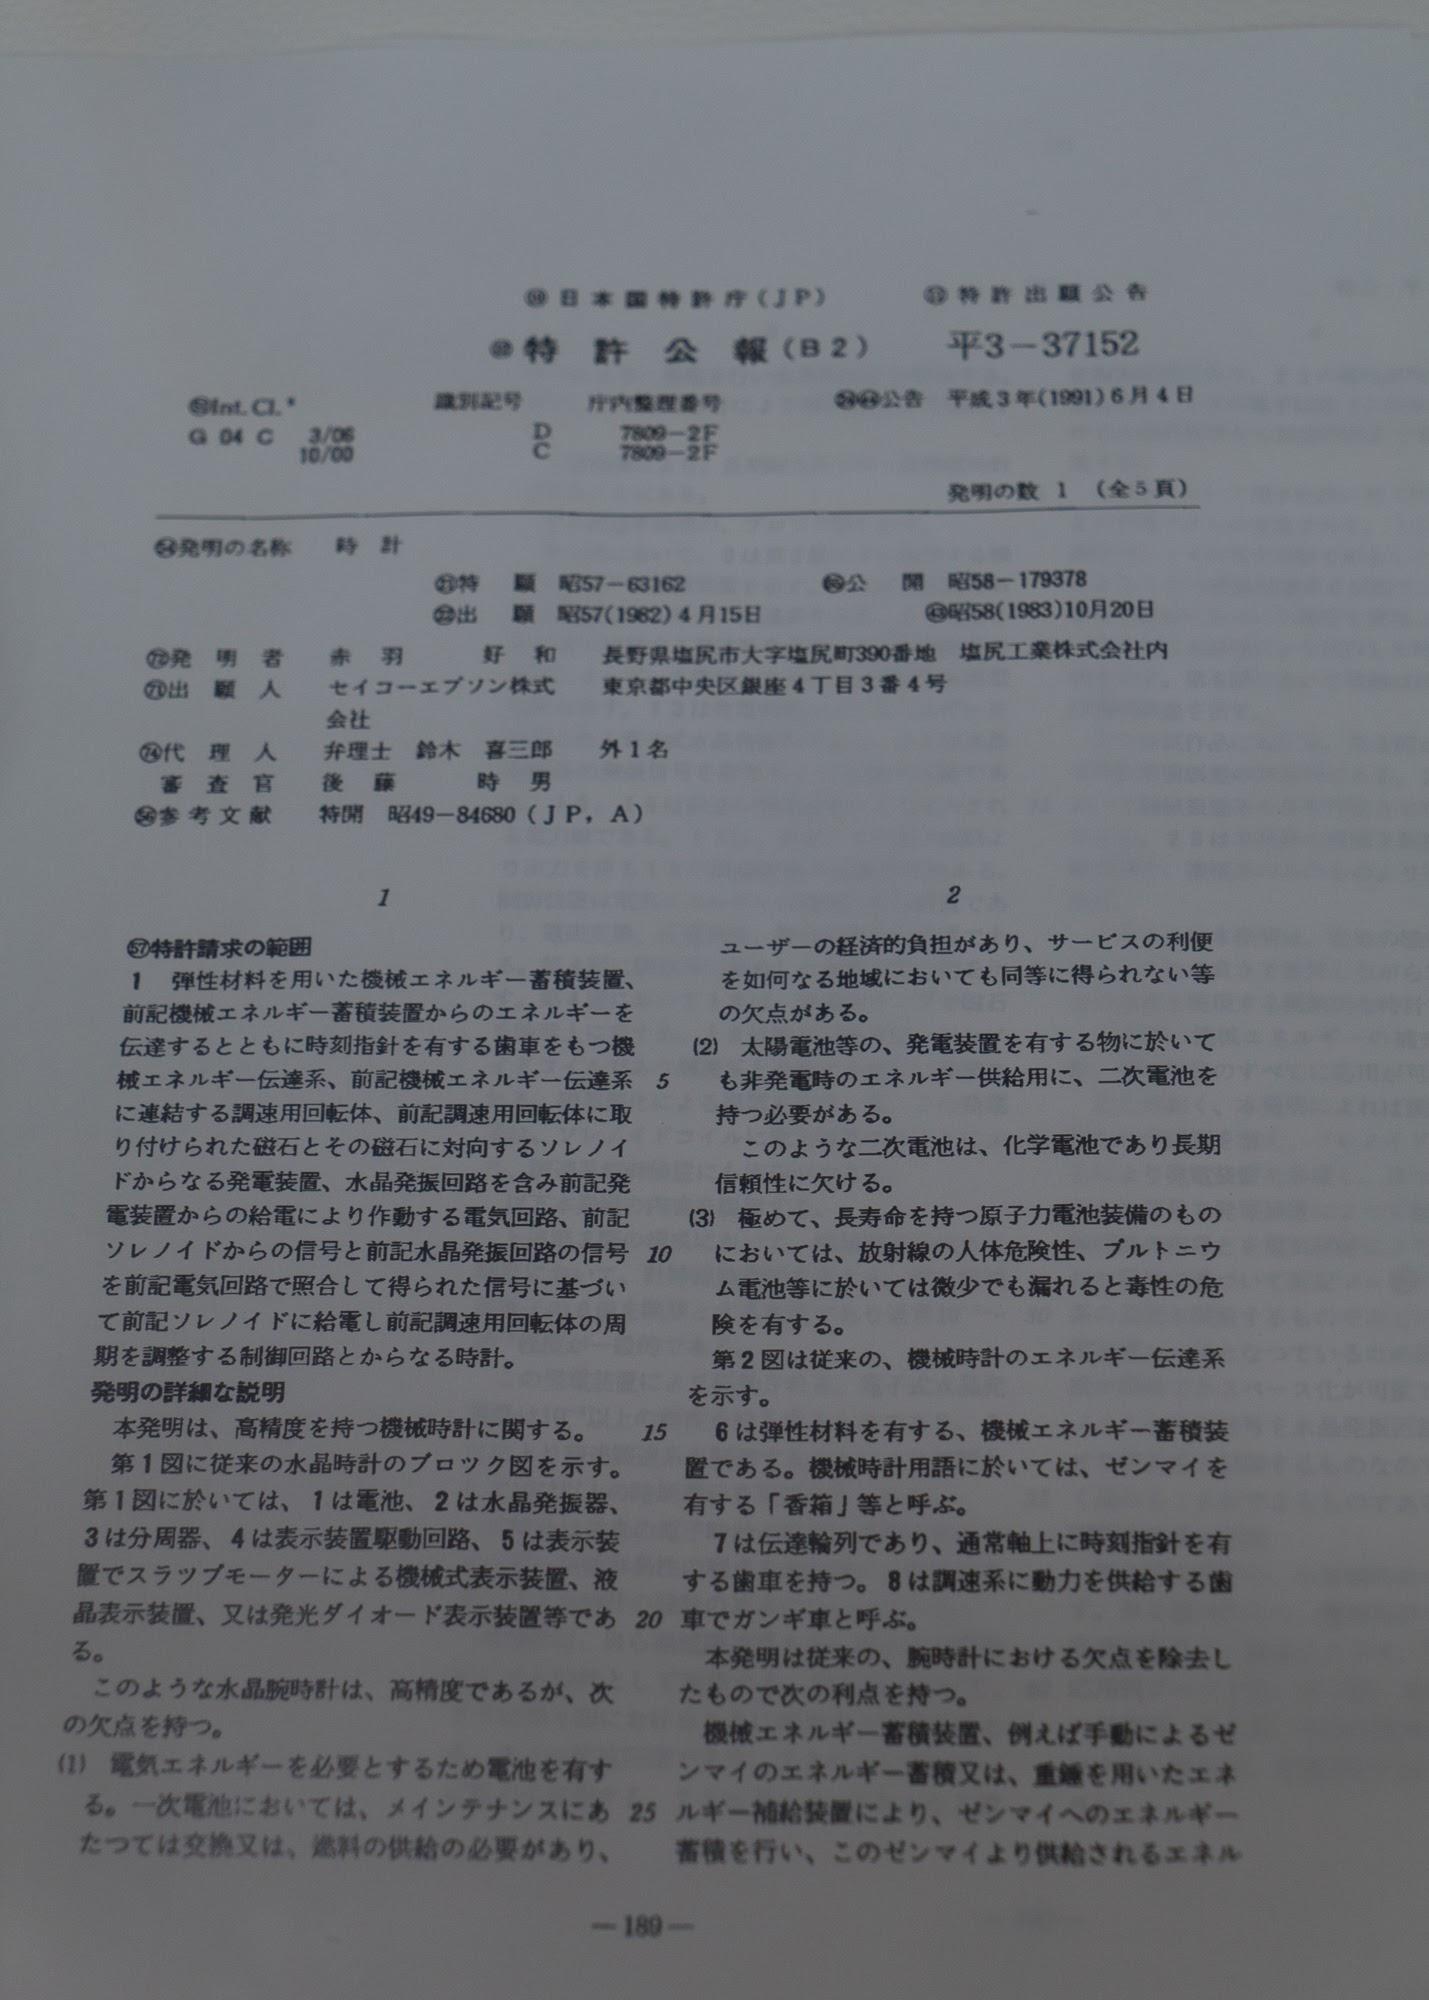 1984 Patent